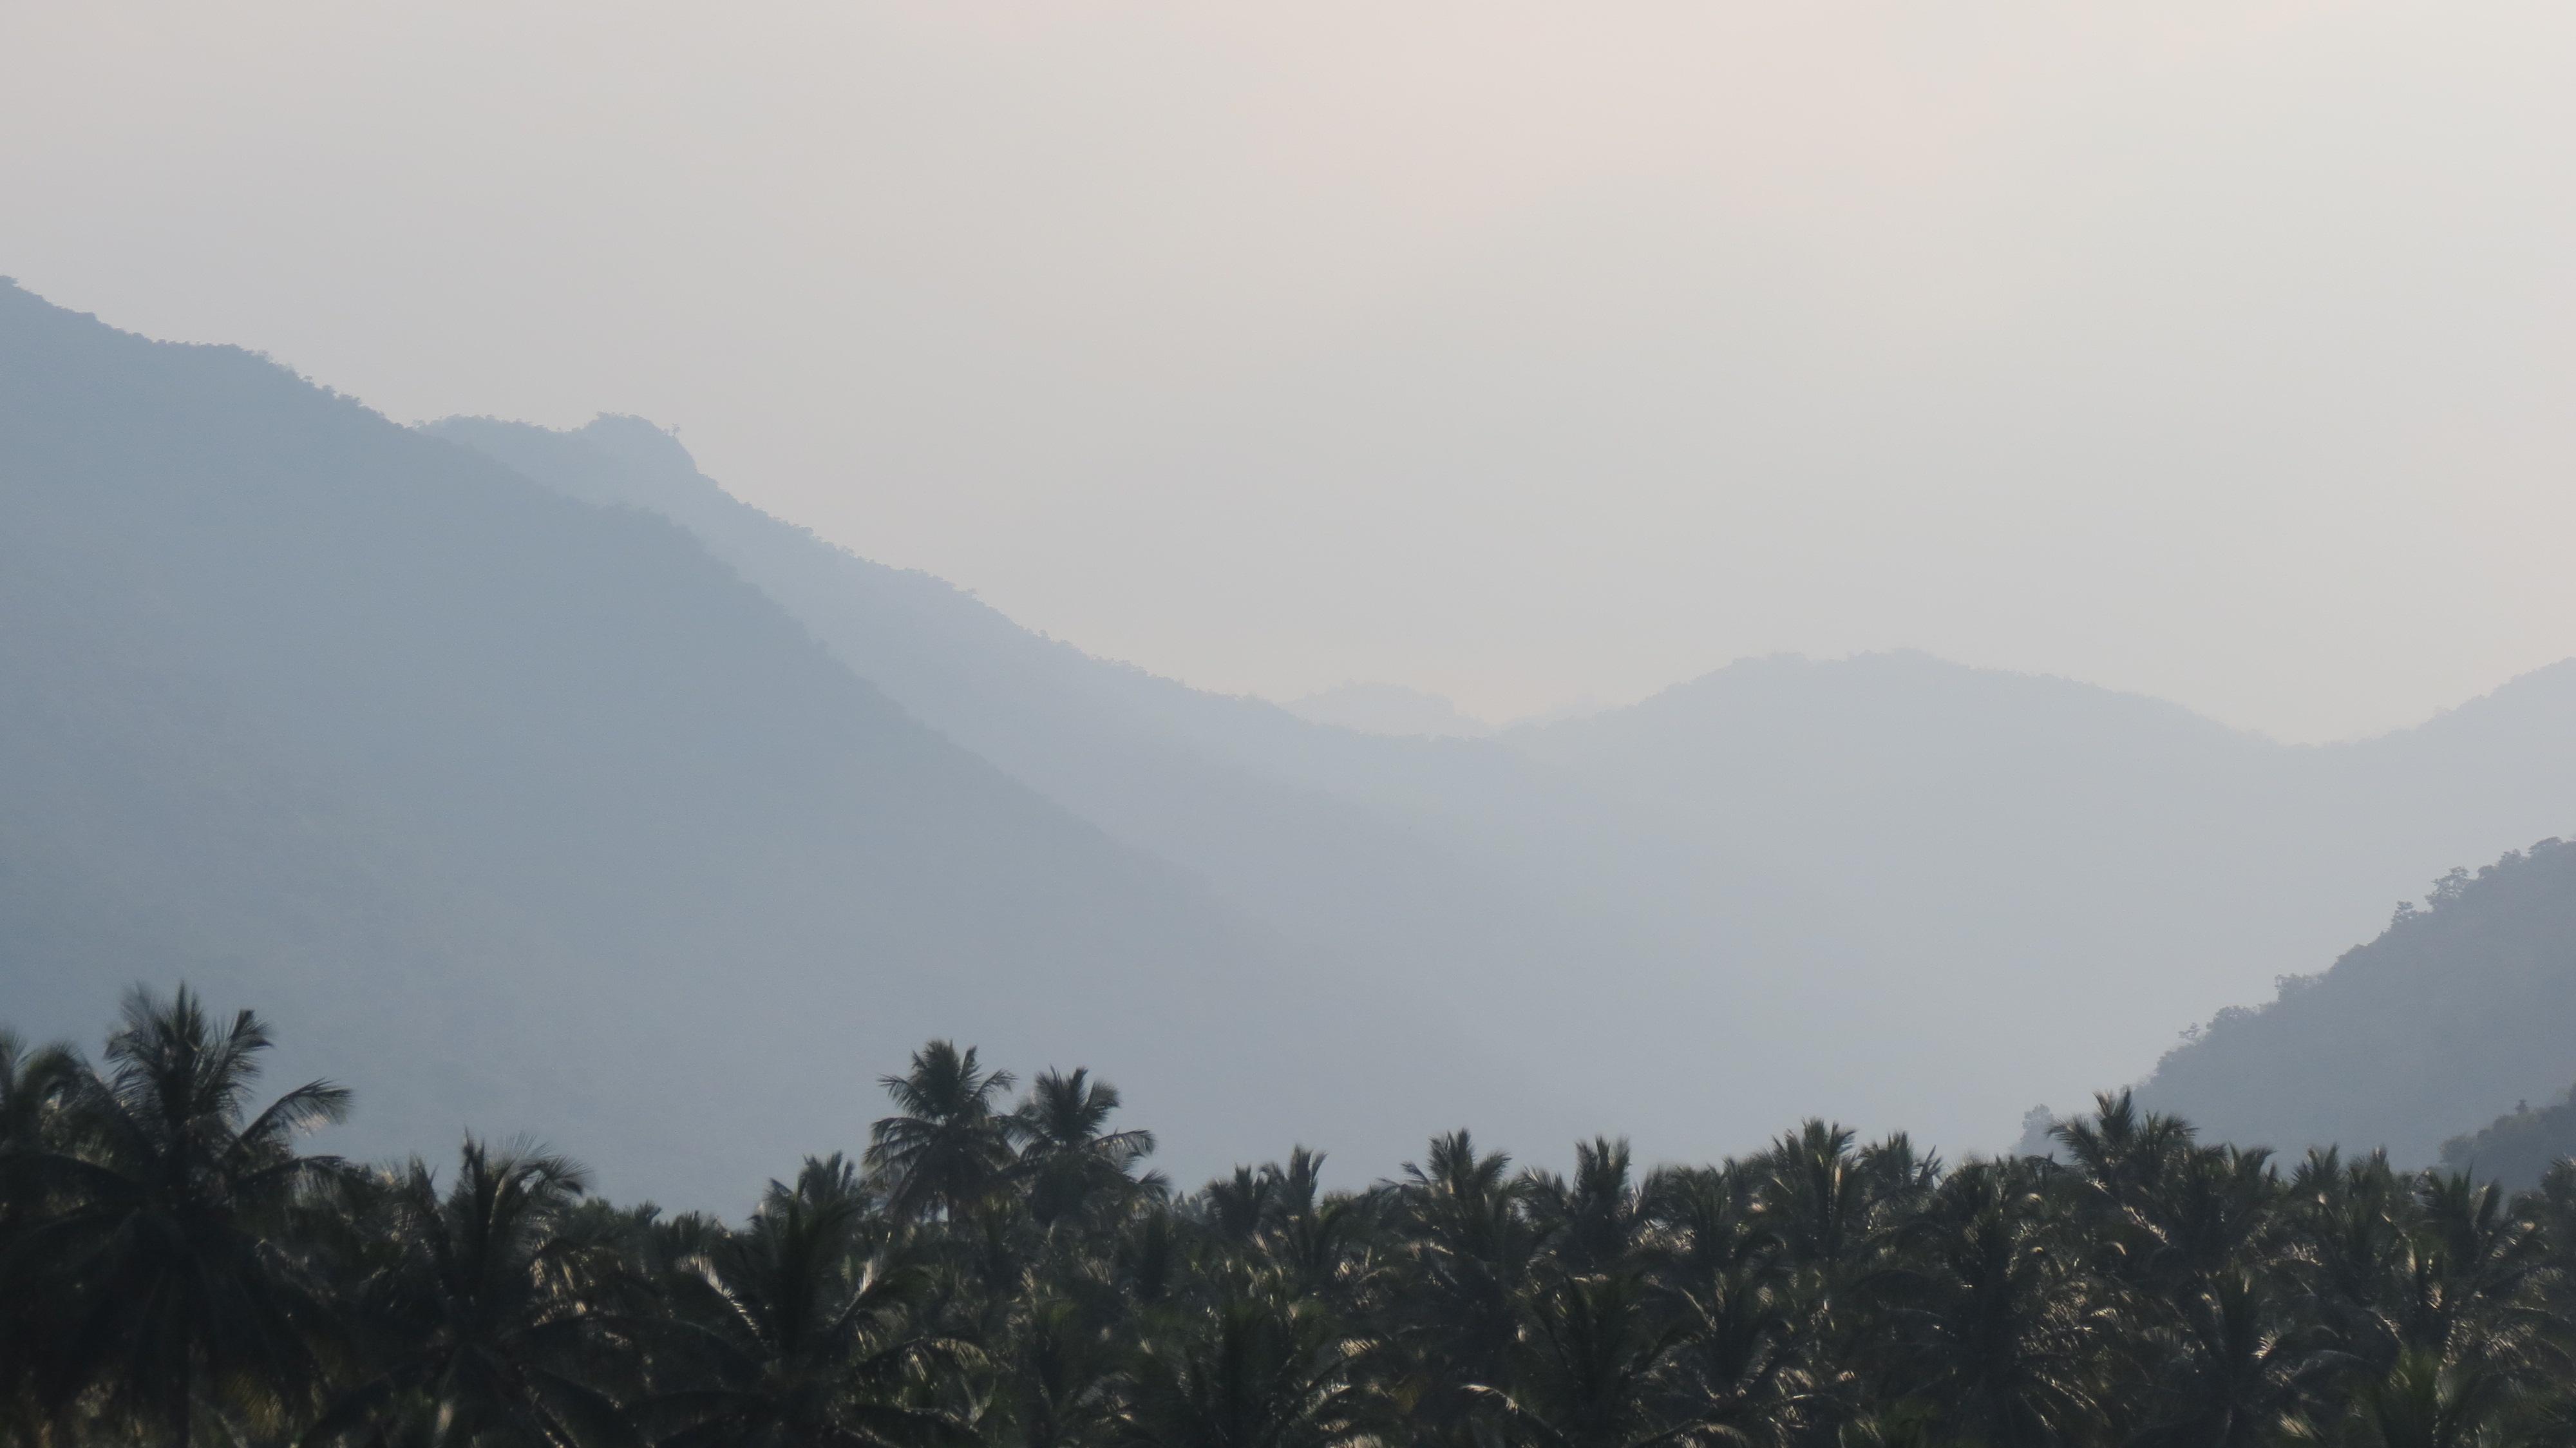 Shevaroy Hills Junglekey In Image